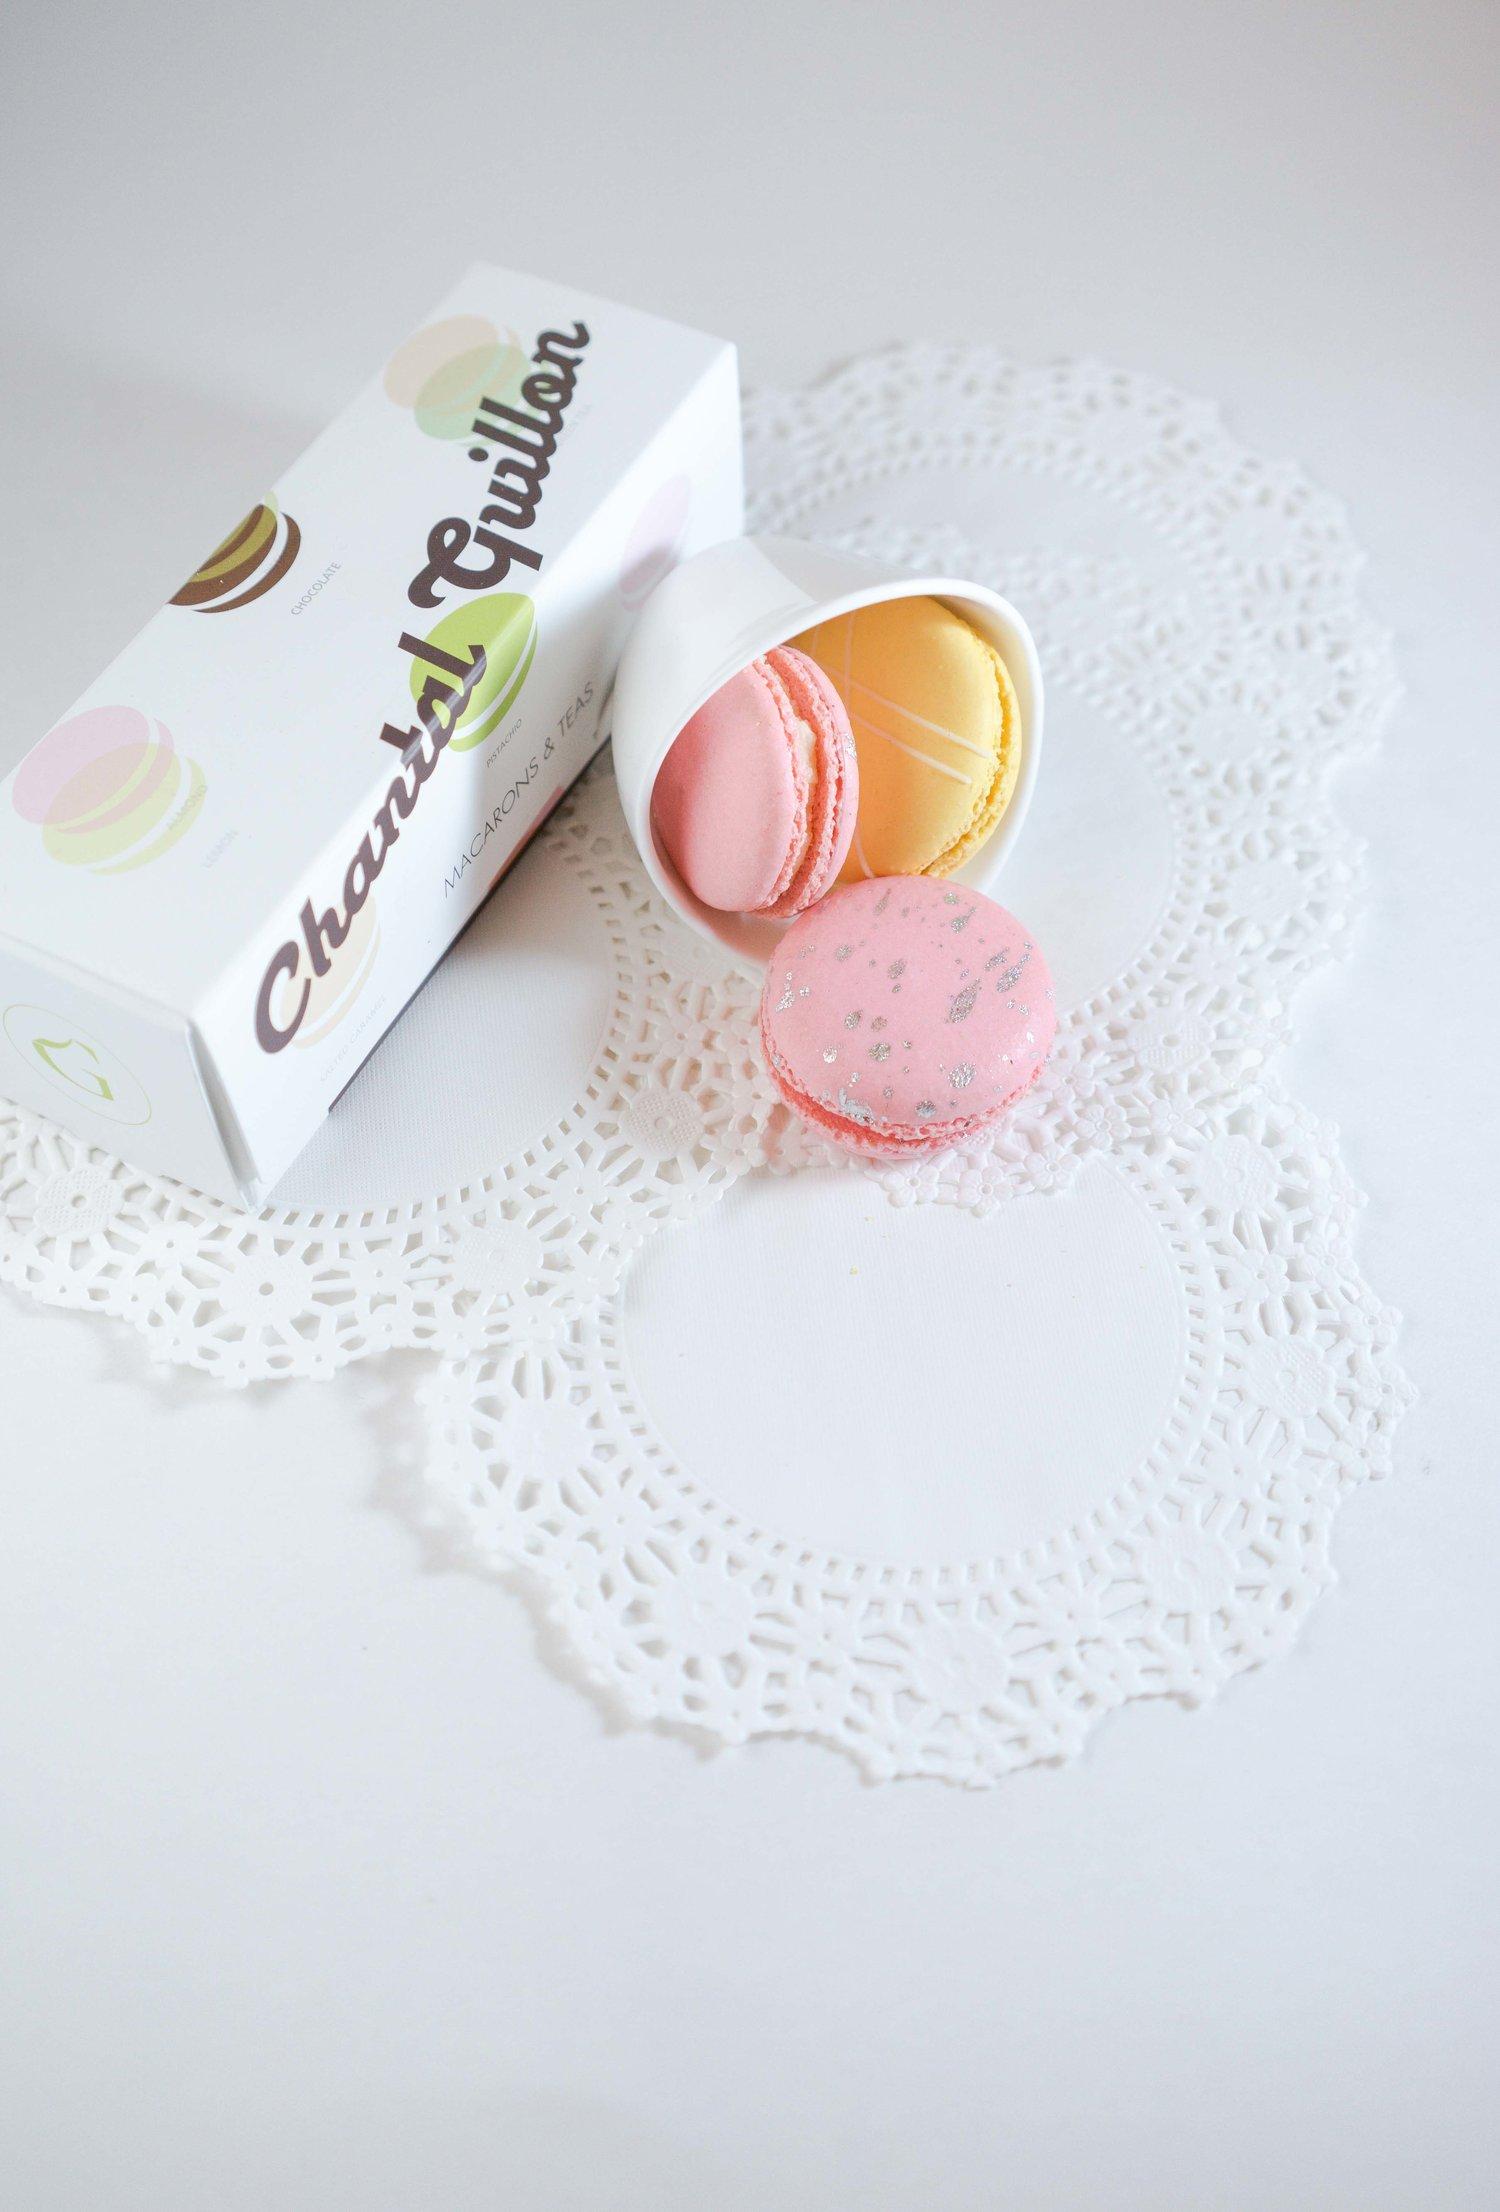 pineaaple-rasberry-macaron-chantal-guillon-photography-by-afewgoodlicks-net